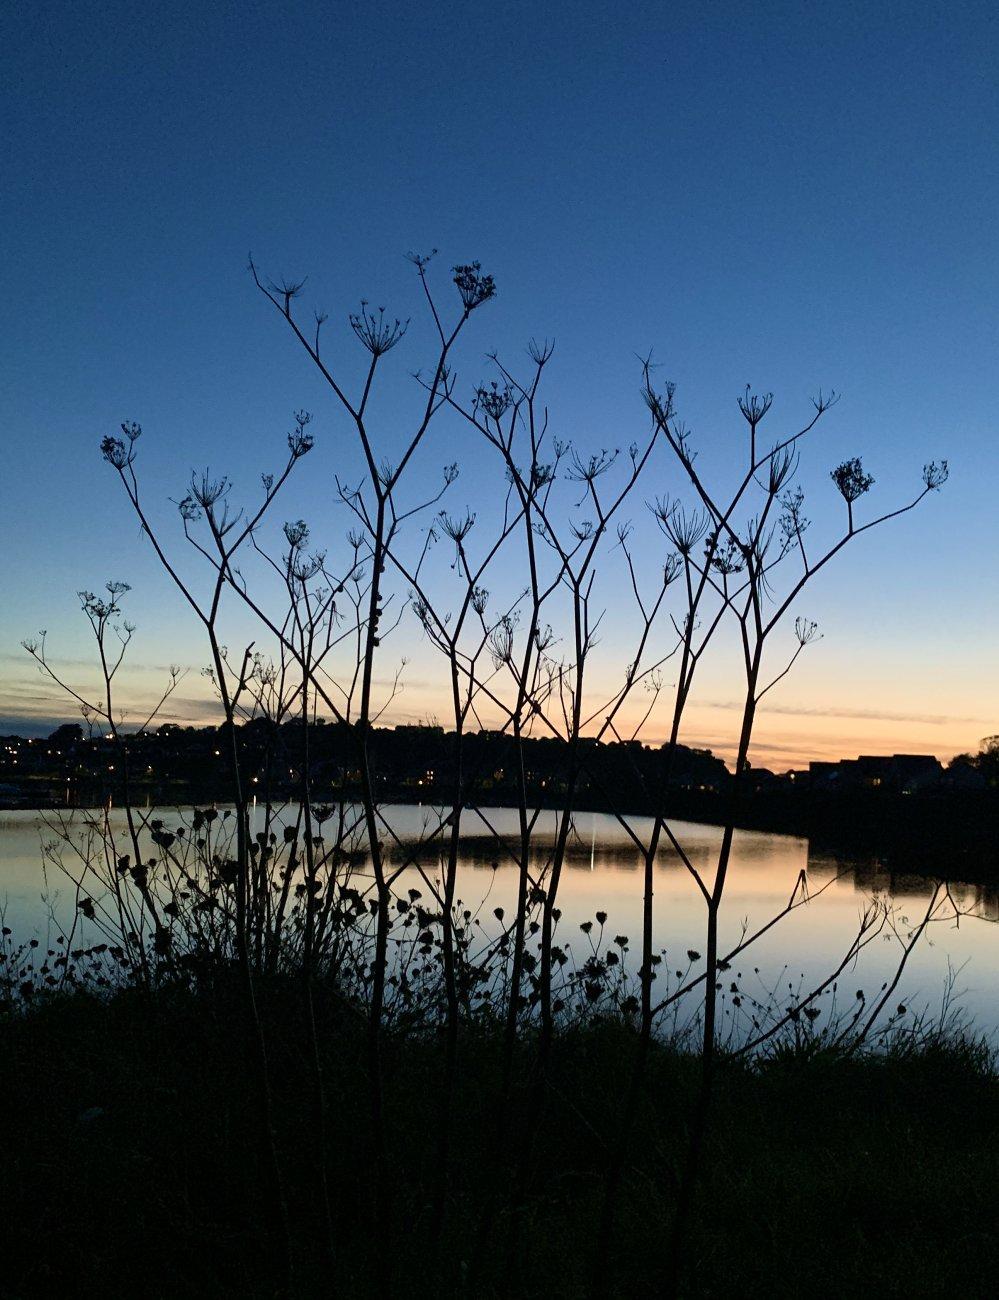 Lakeside Silhouette